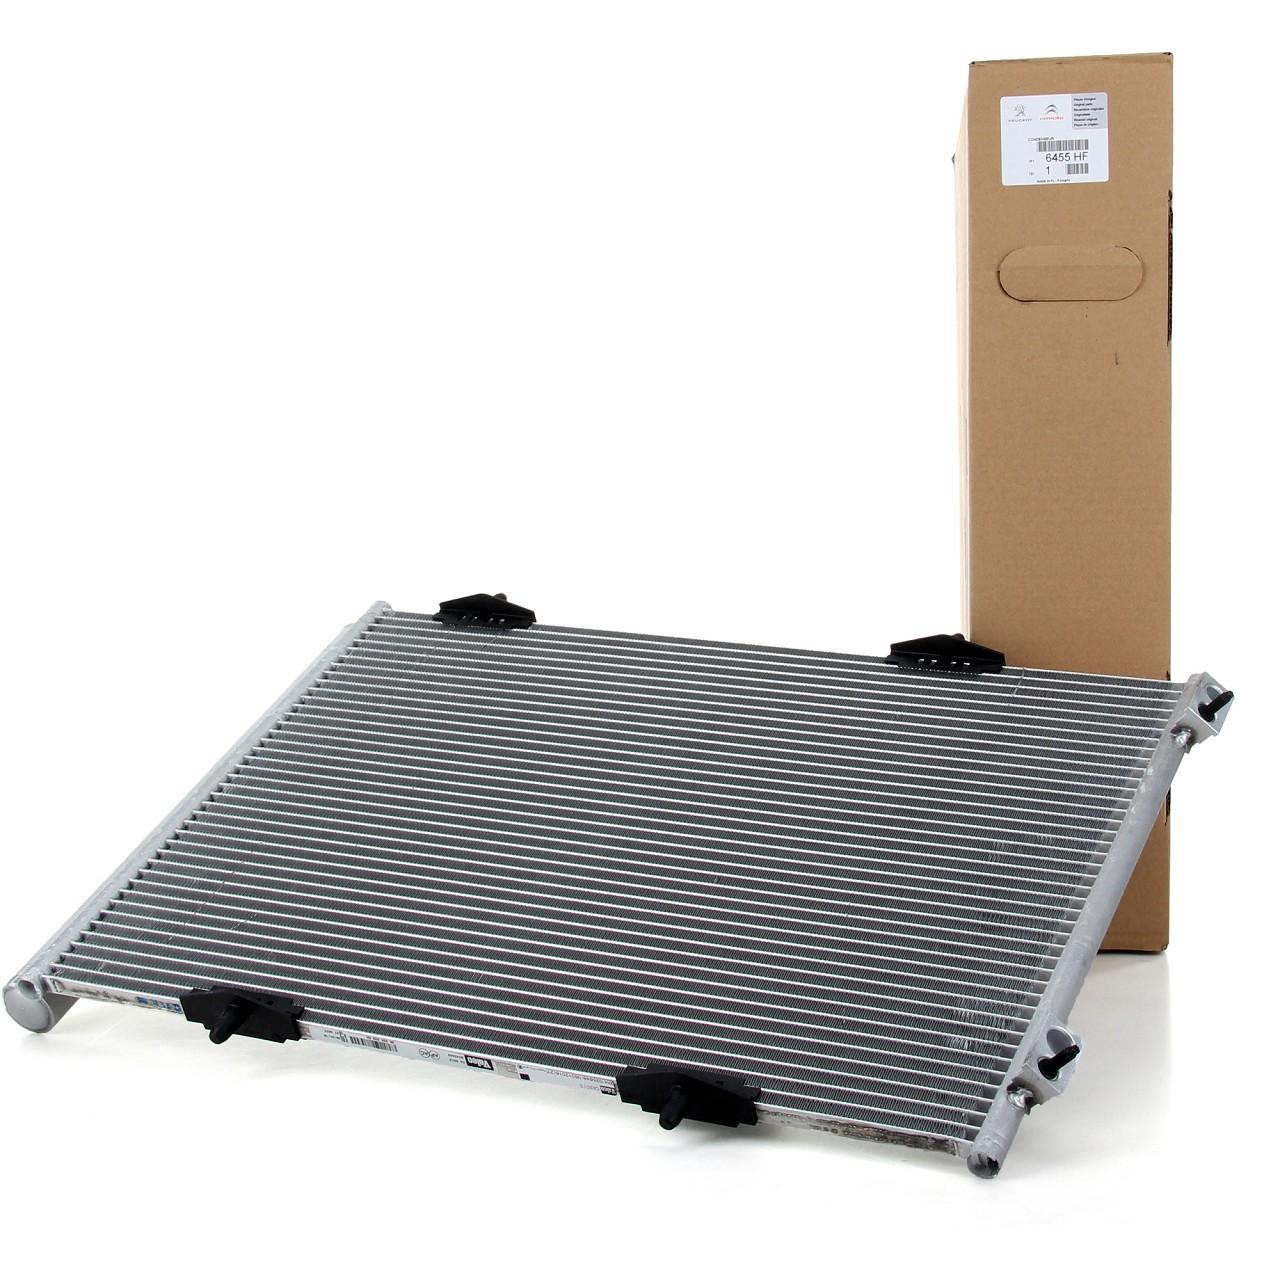 ORIGINAL Citroen Peugeot Kondensator Klimakondensator Klimakühler 6455.HF